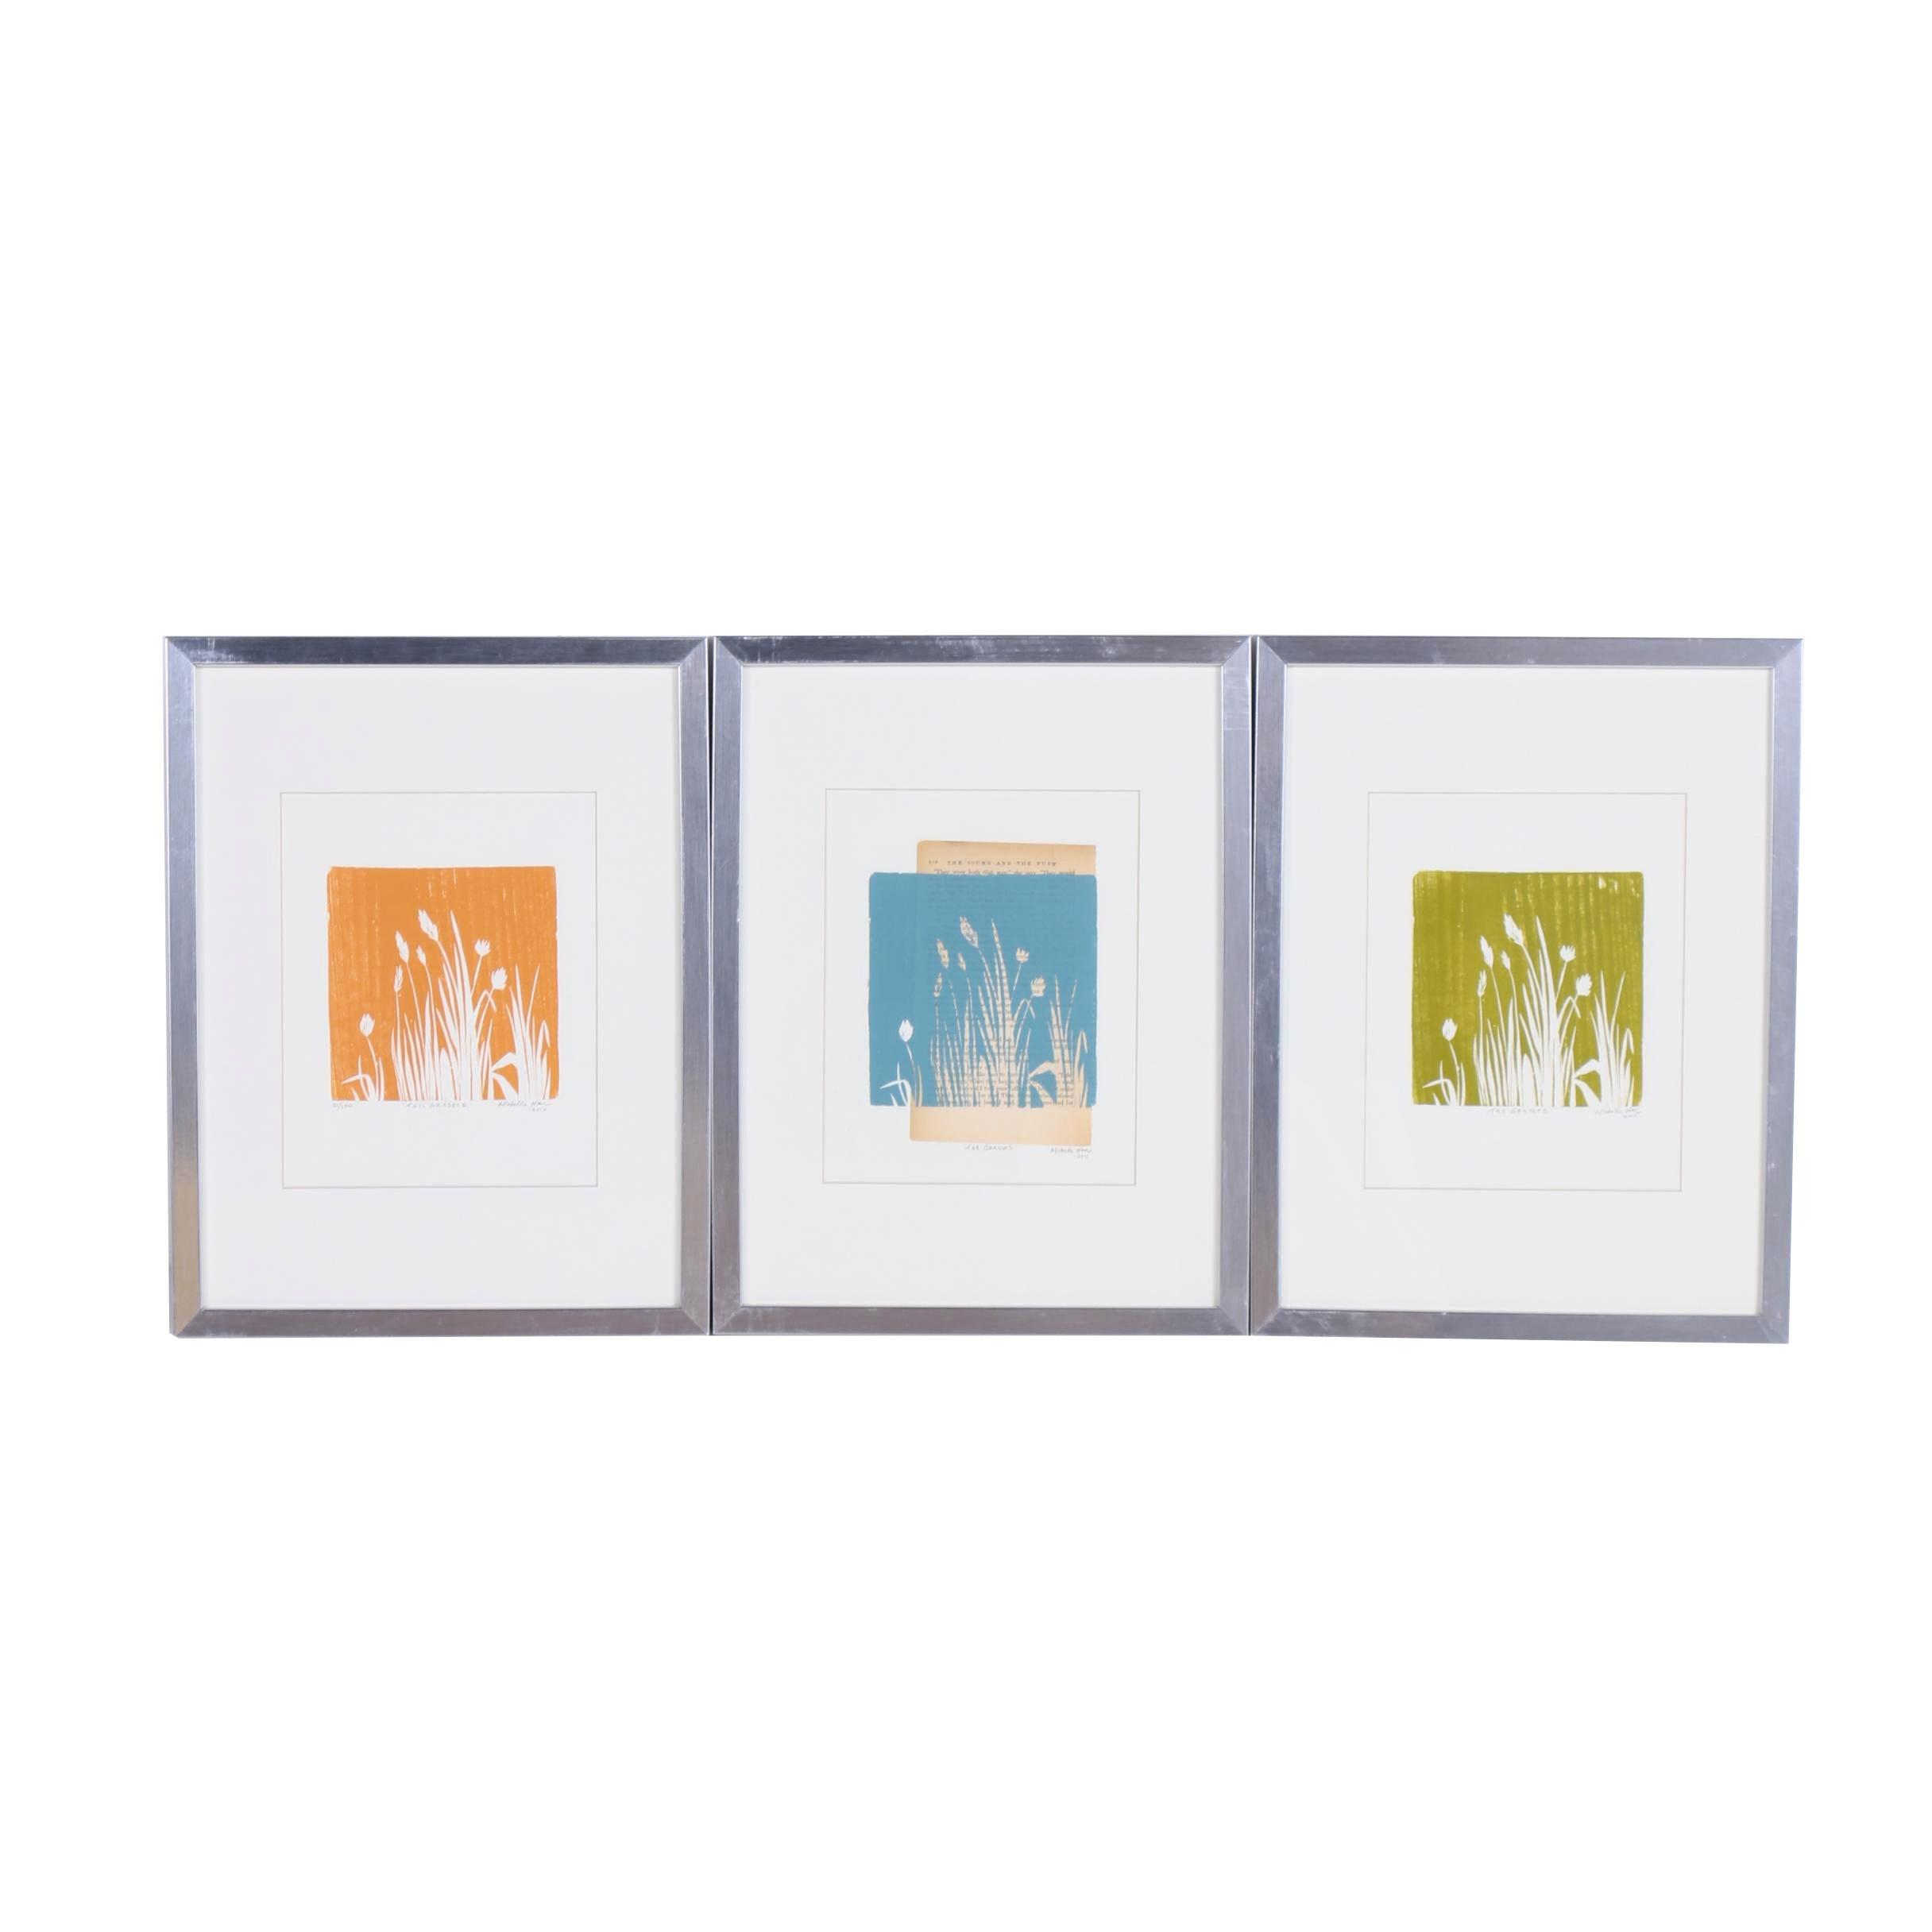 "2010 Michelle Han ""Tall Grasses""  Woodblock Prints"